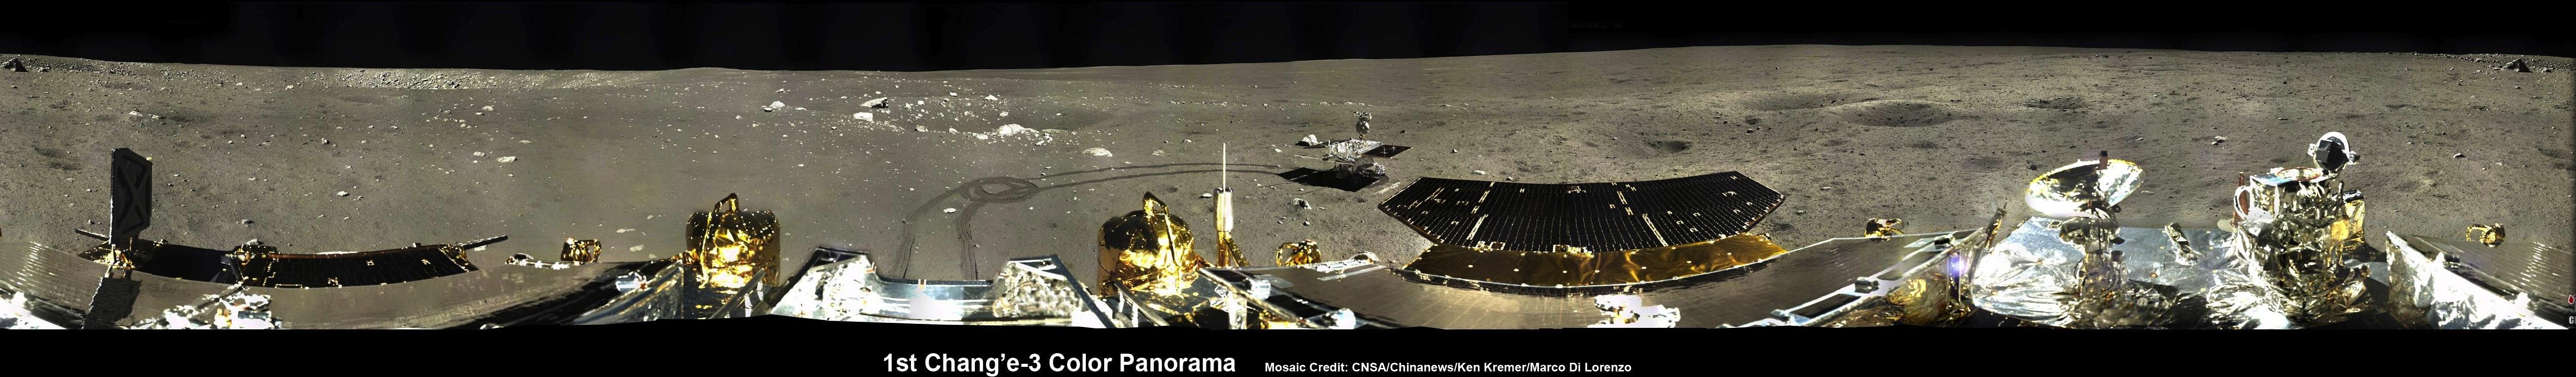 Stunning Panoramas Put China's Moon Rover and Lander in Lunar Spotlight (Photos)